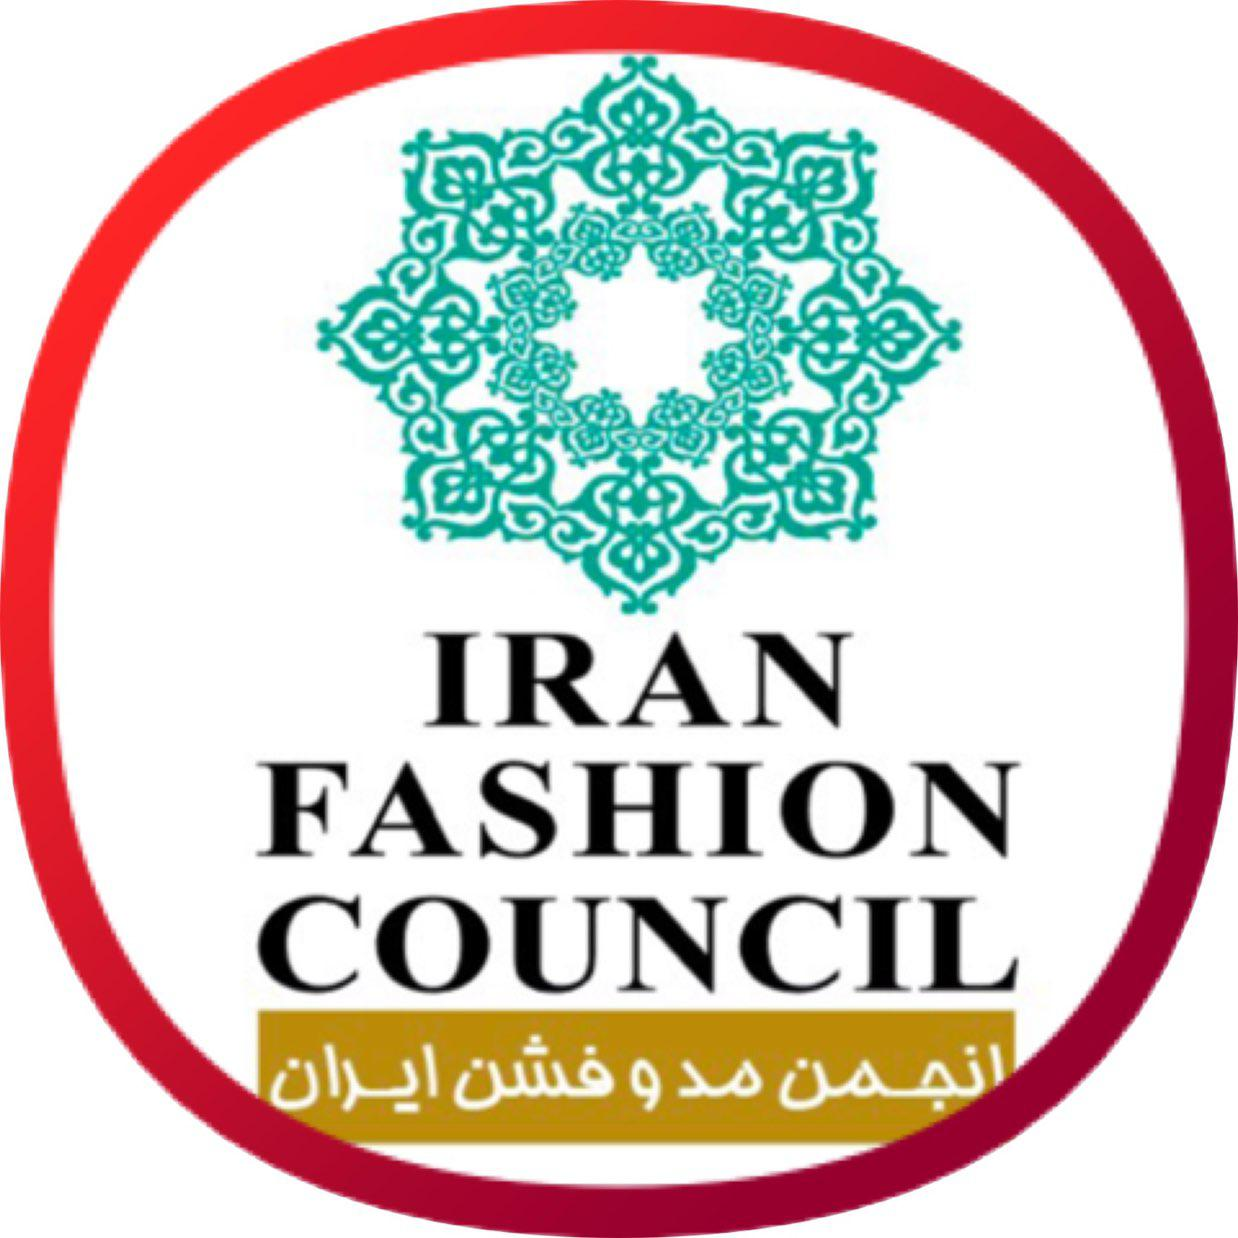 Iran Fashion Council Clubhouse